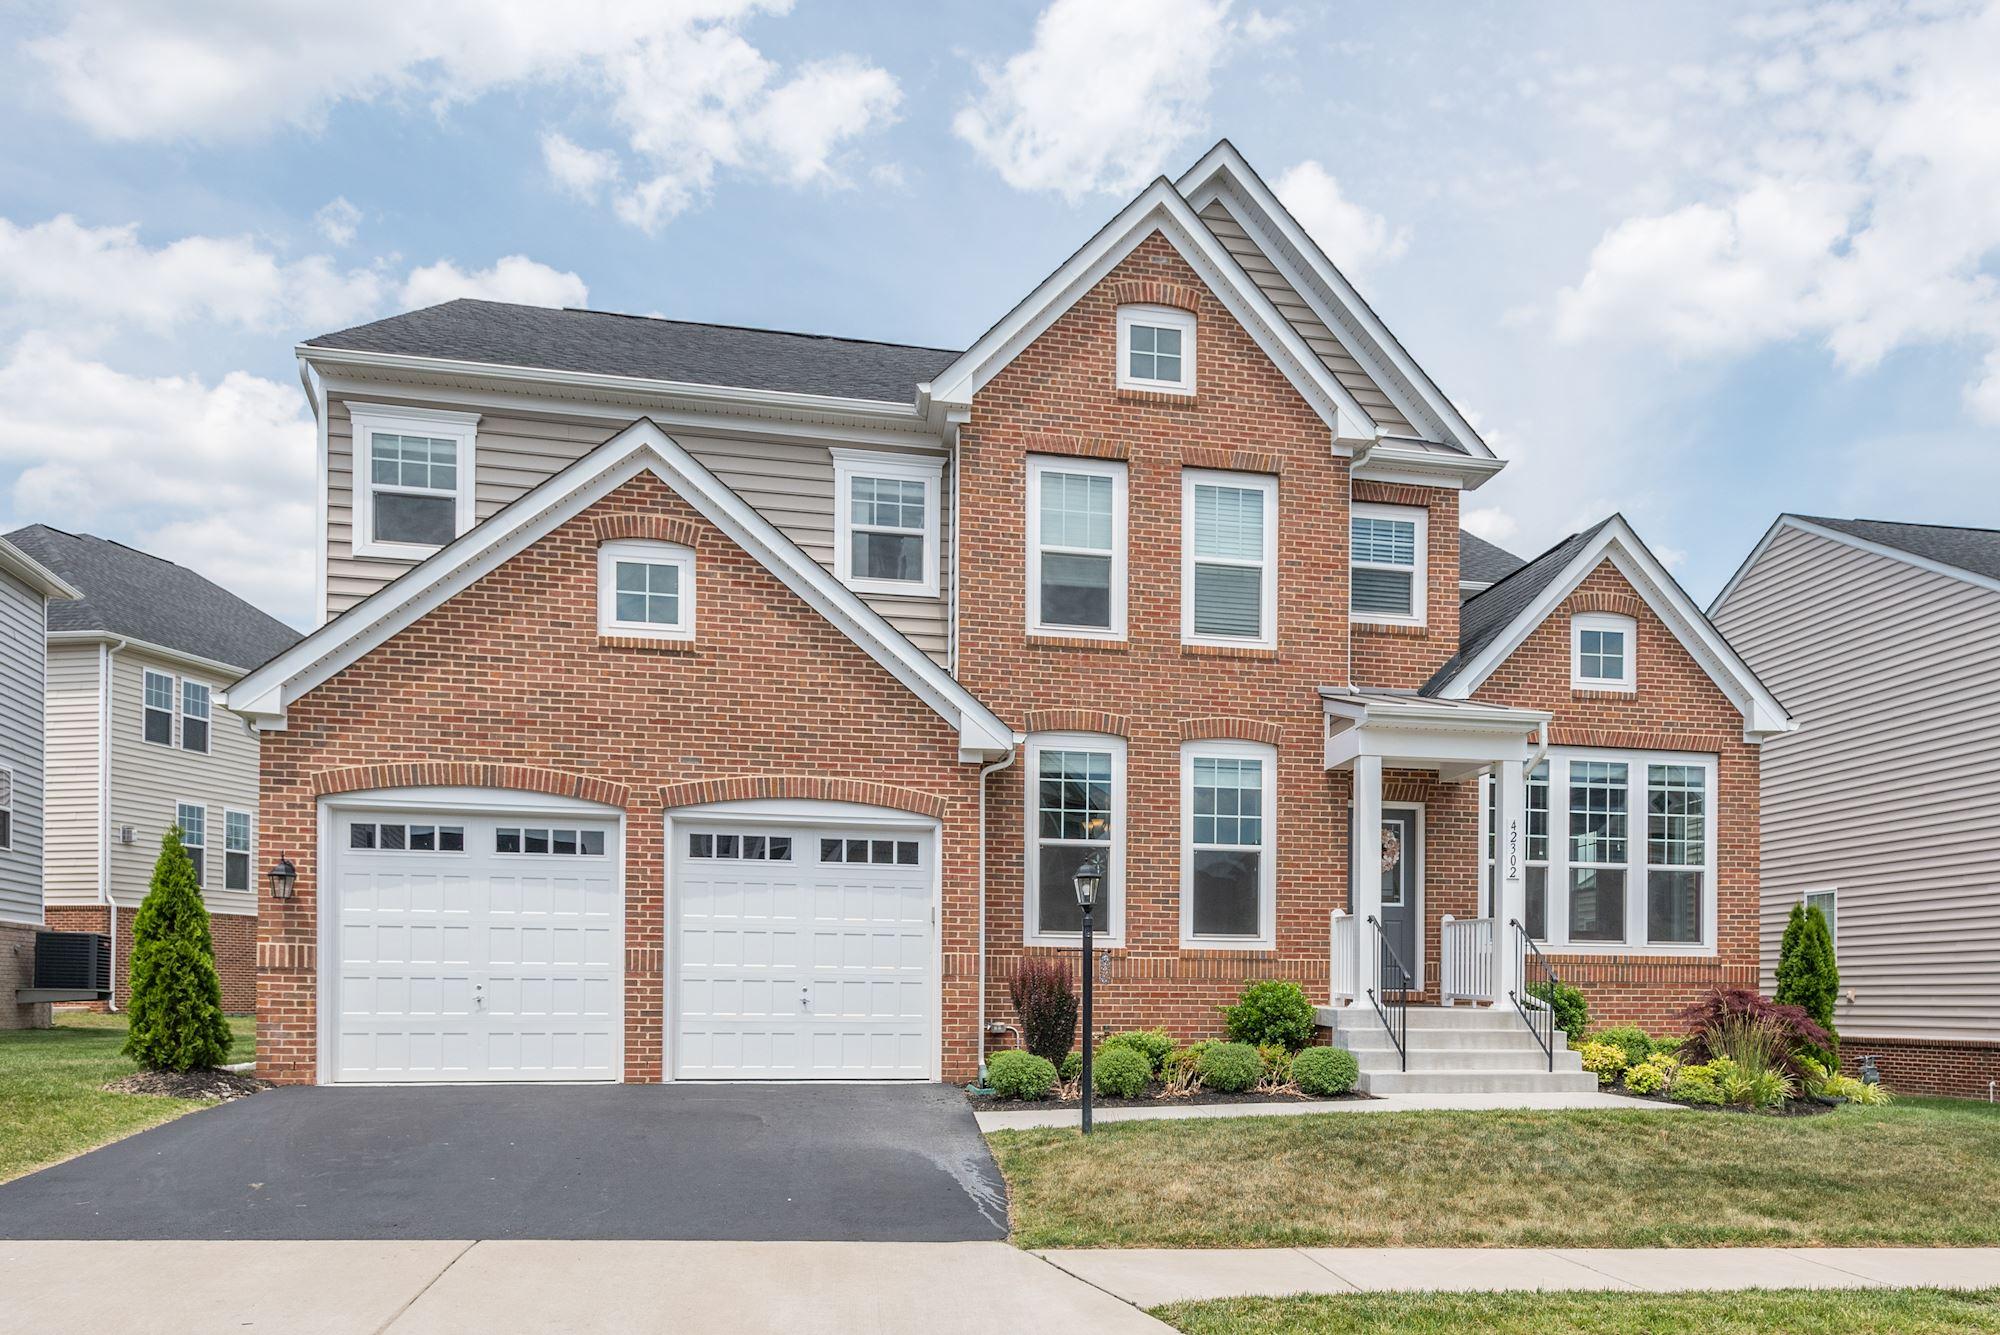 SOLD:Perfection in Brambleton! 6 BD Van Metre Home in Ashburn, VA